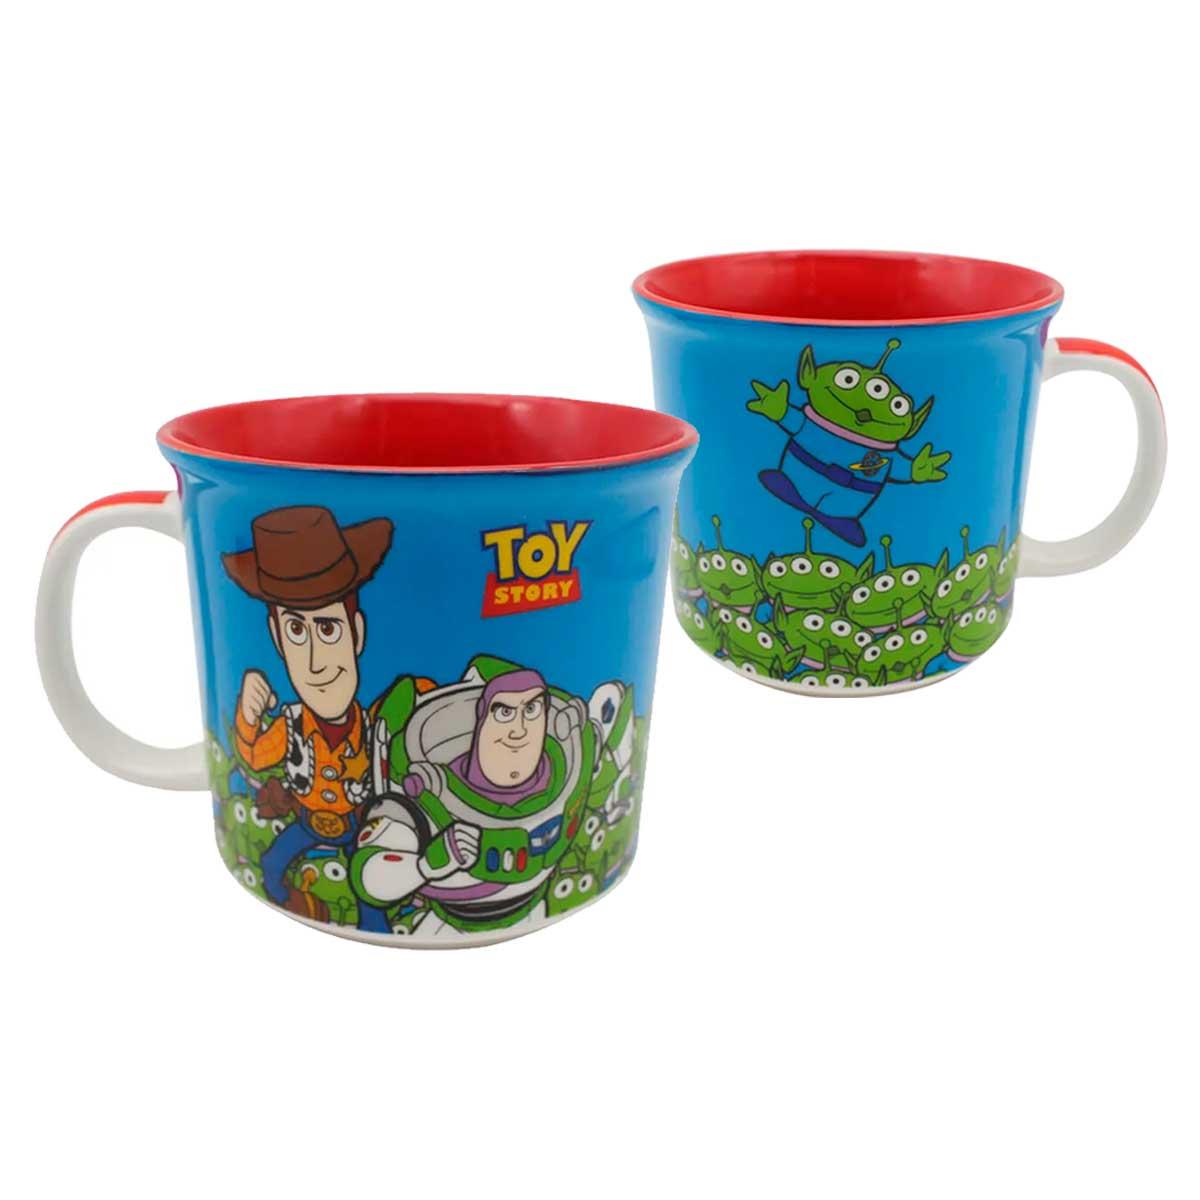 Kit Copo Térmico e Caneca Toy Story Wood e Buzz Lightyear